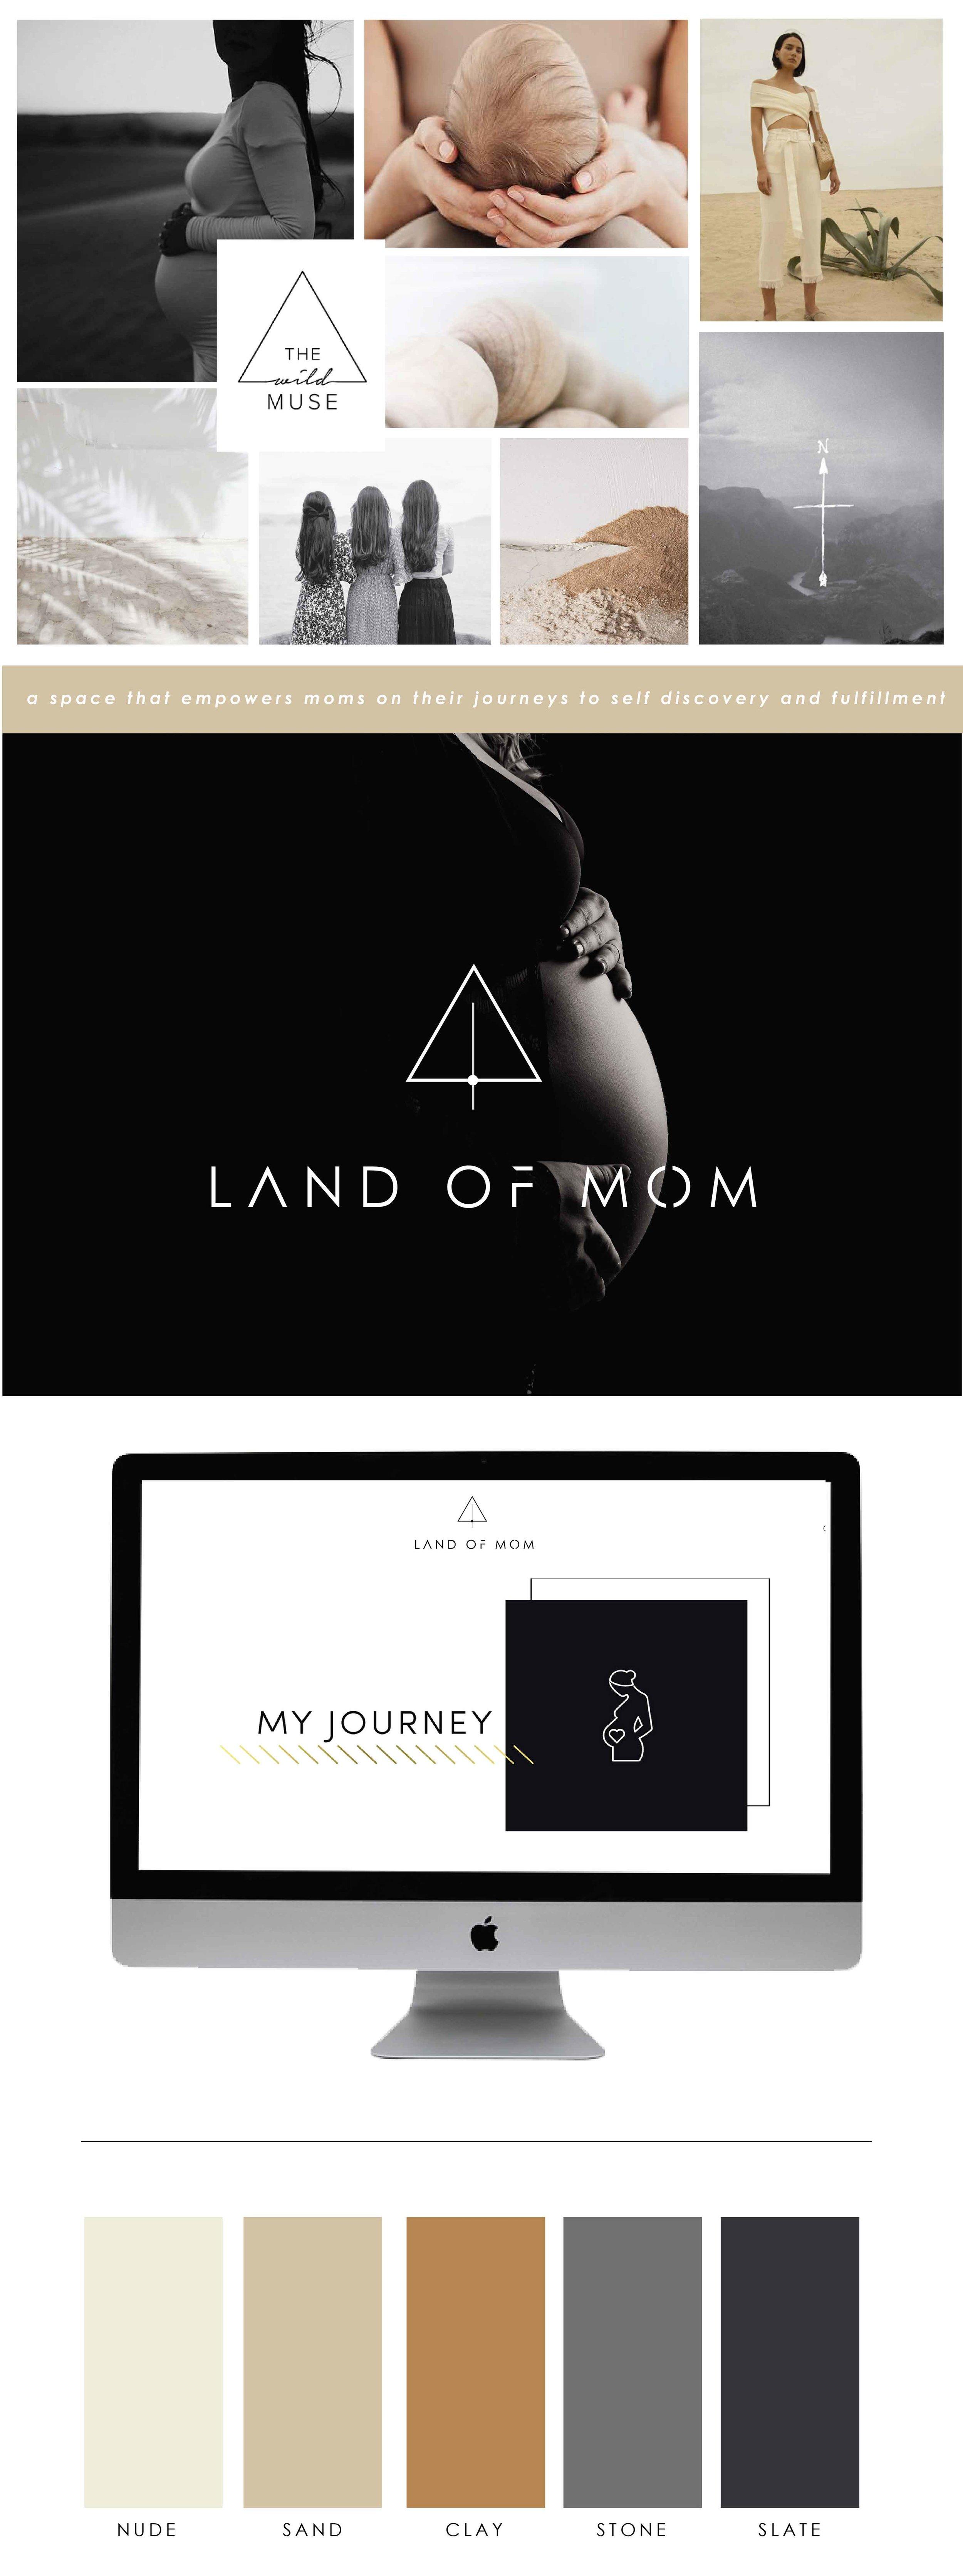 brand-board-land-of-mom-logo.jpg